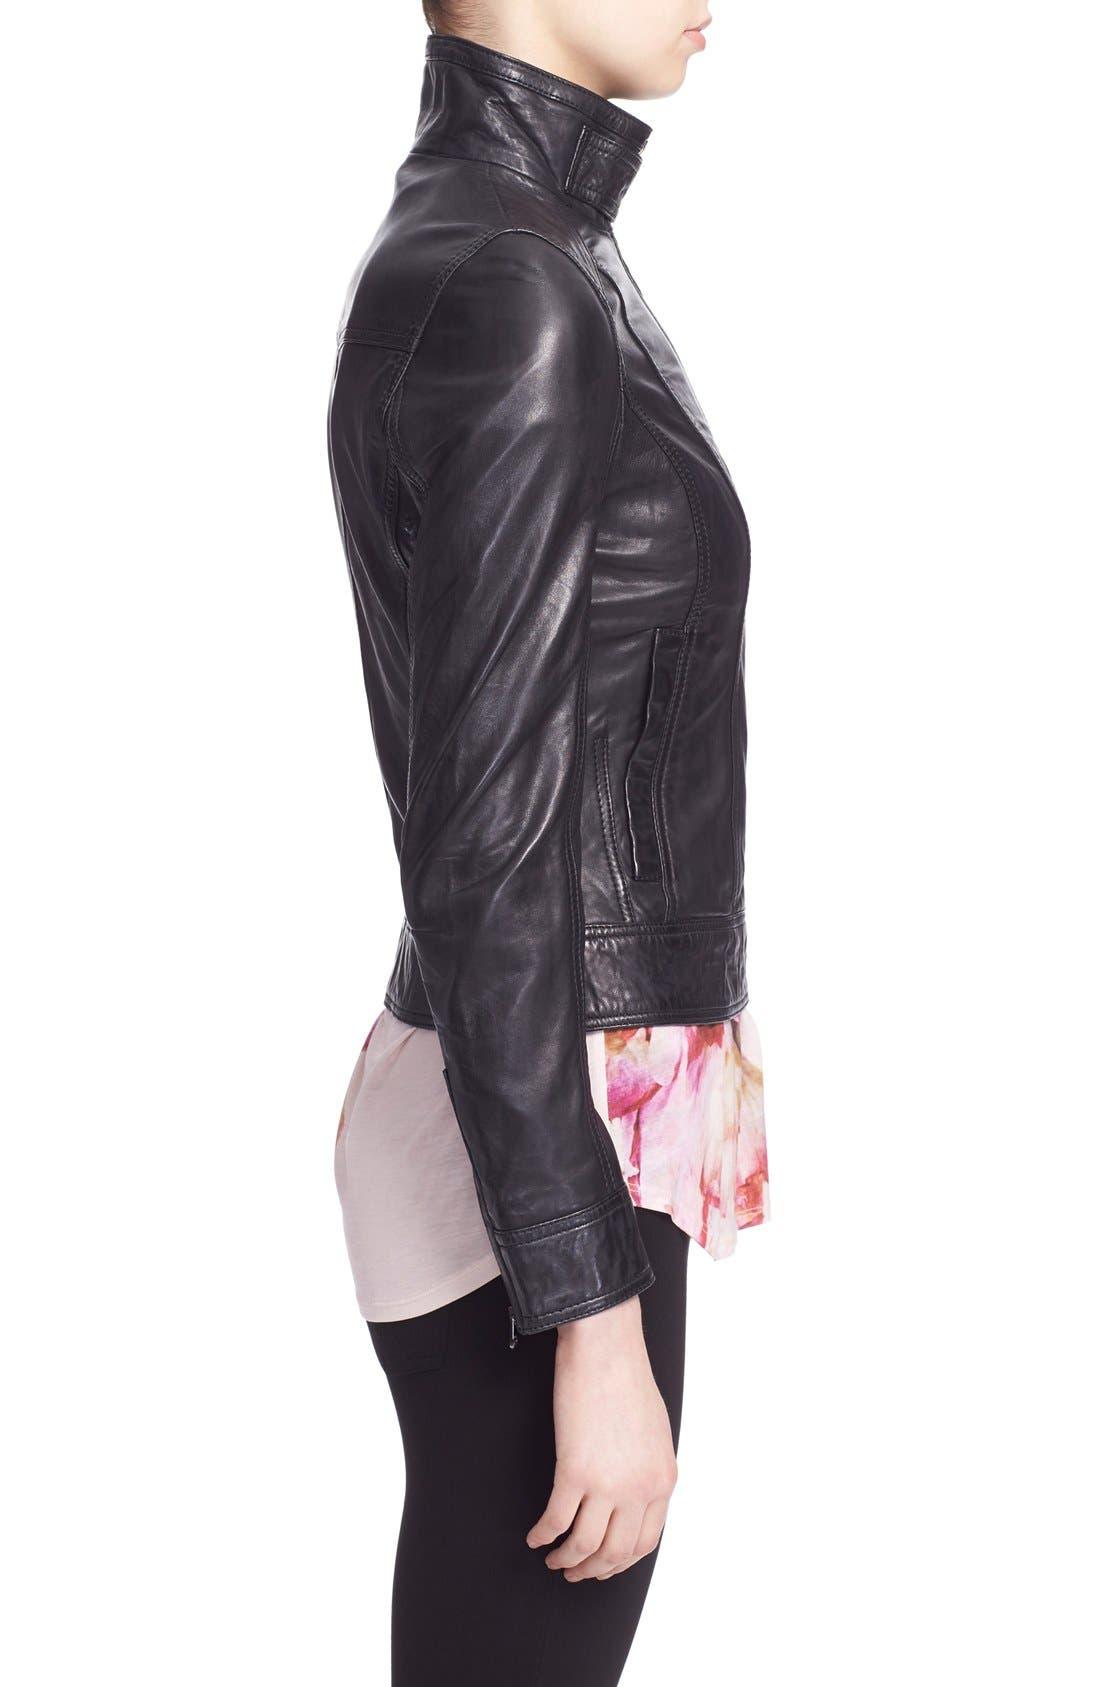 TED BAKER LONDON, 'Roark' Stand Collar Leather Jacket, Alternate thumbnail 5, color, 001